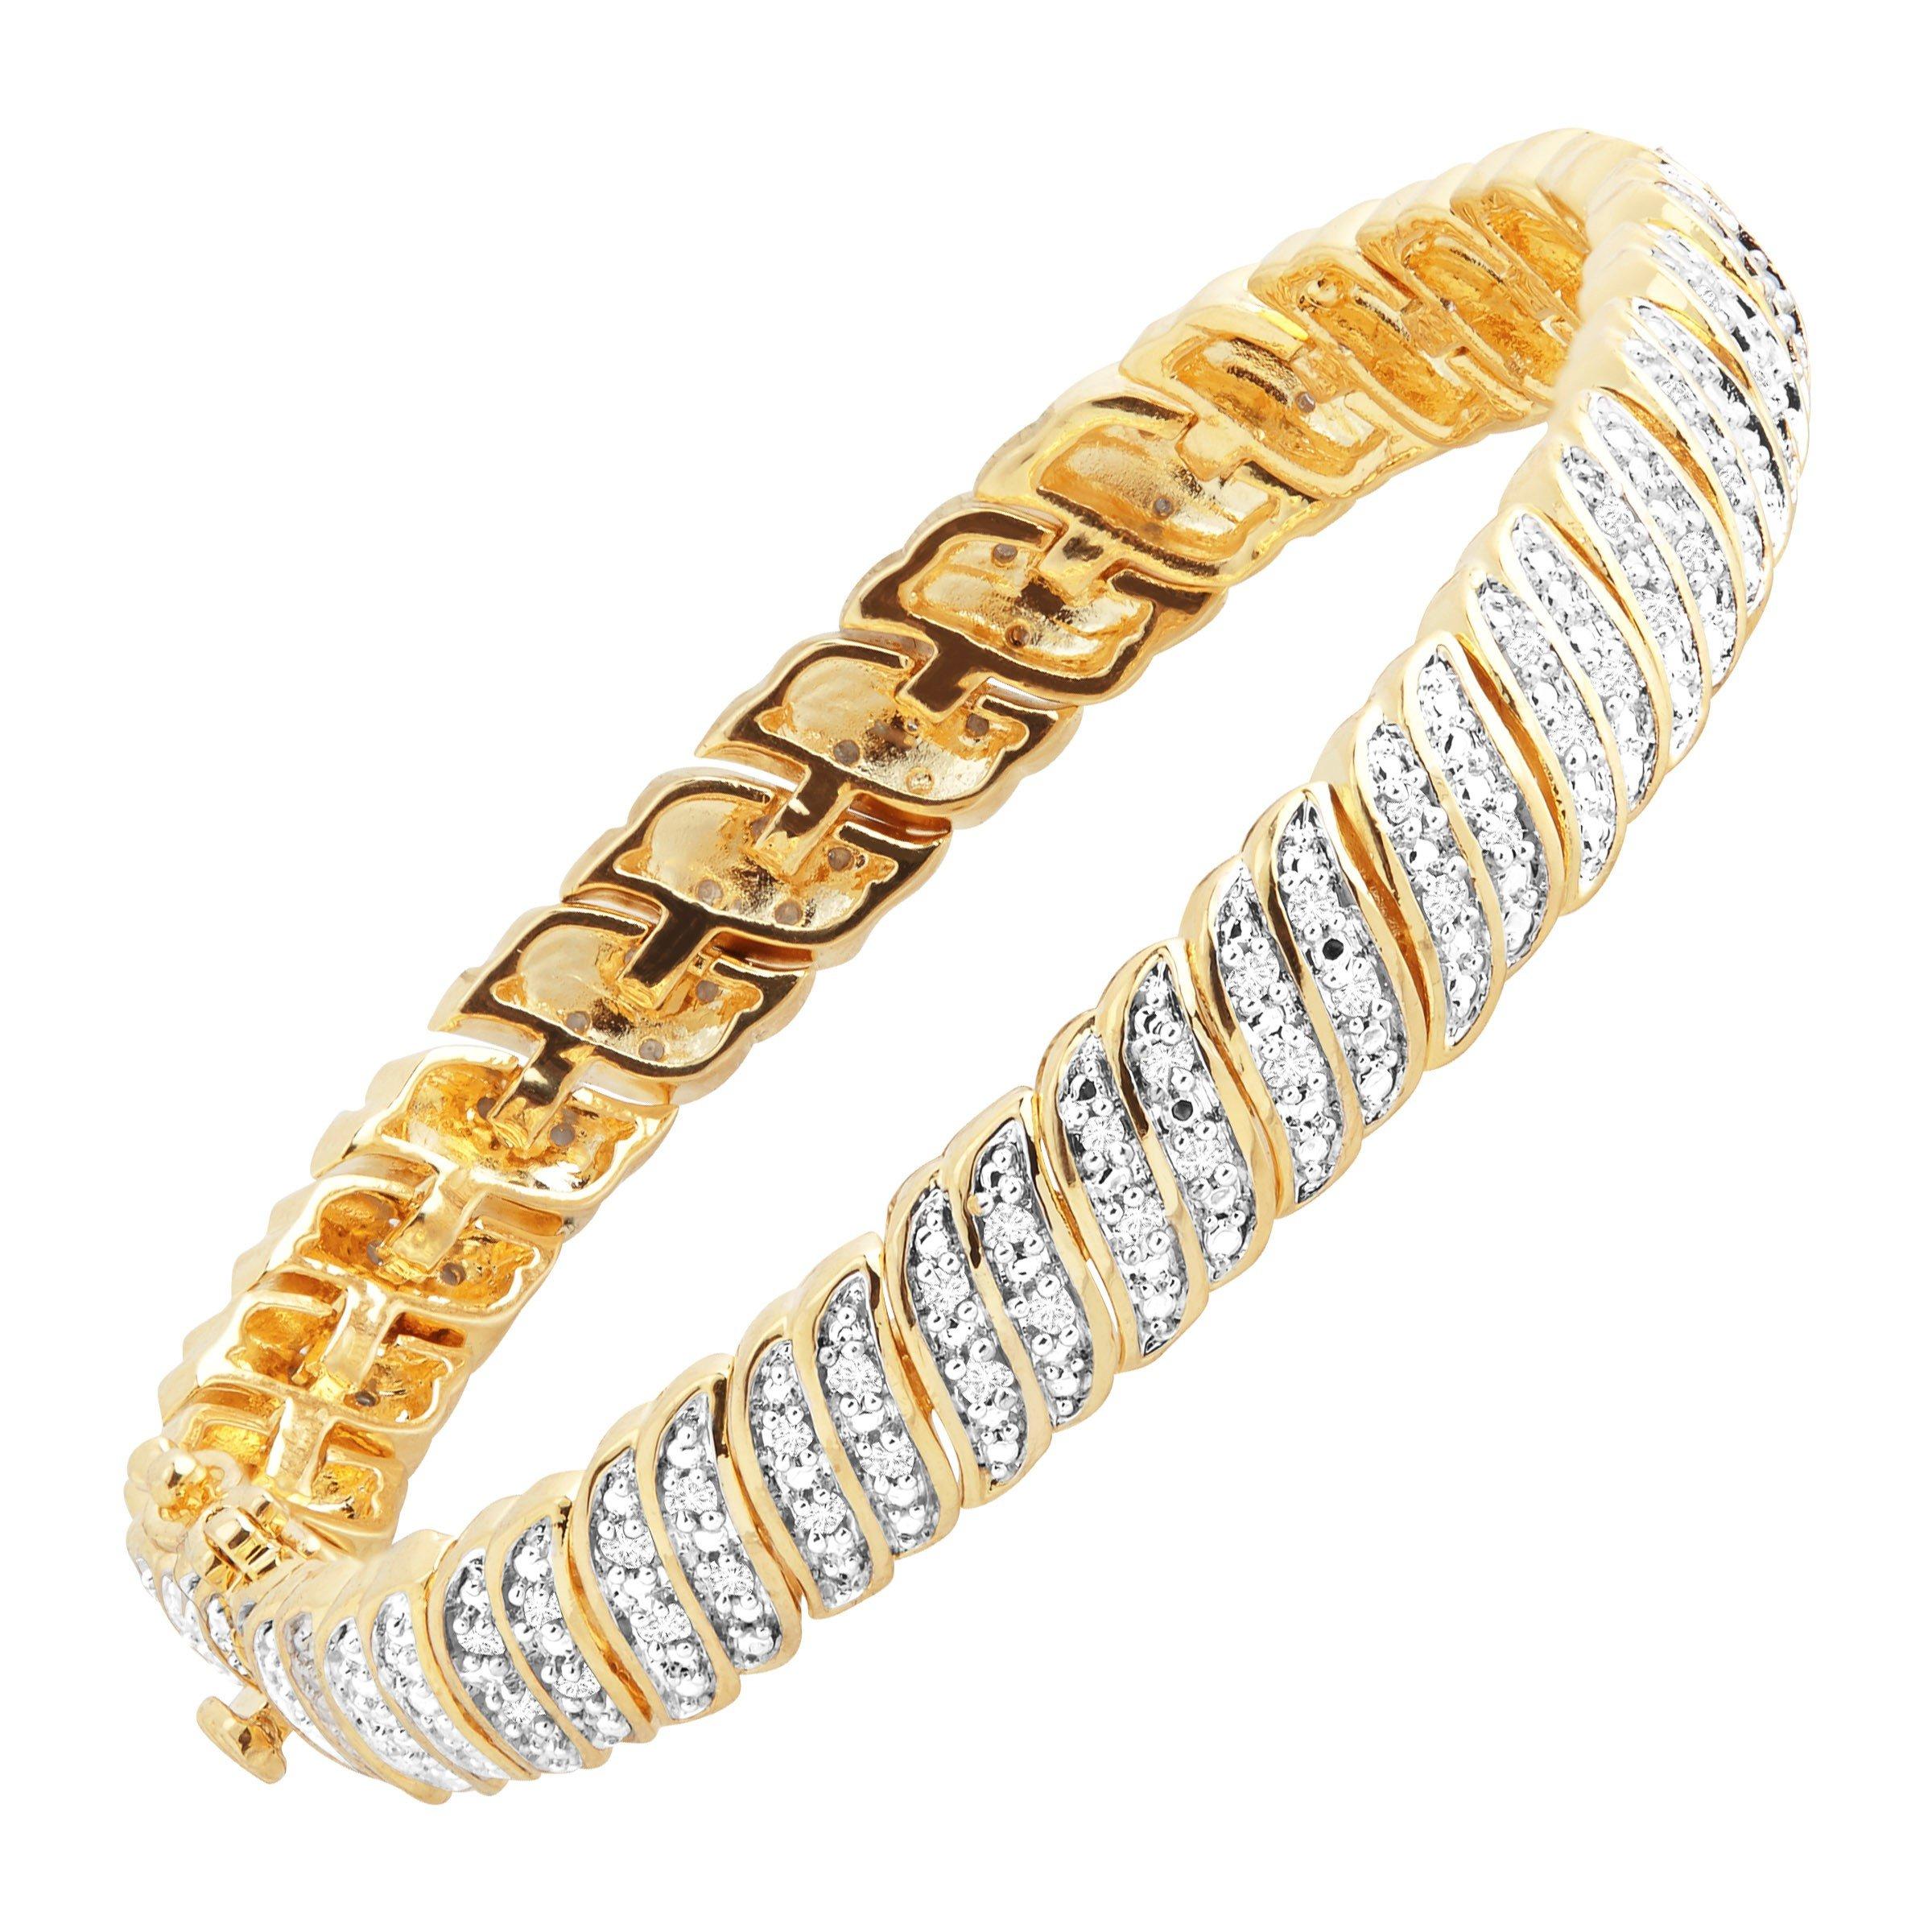 1 ct Diamond 'S' Link Tennis Bracelet in 18K Gold-Plated Brass